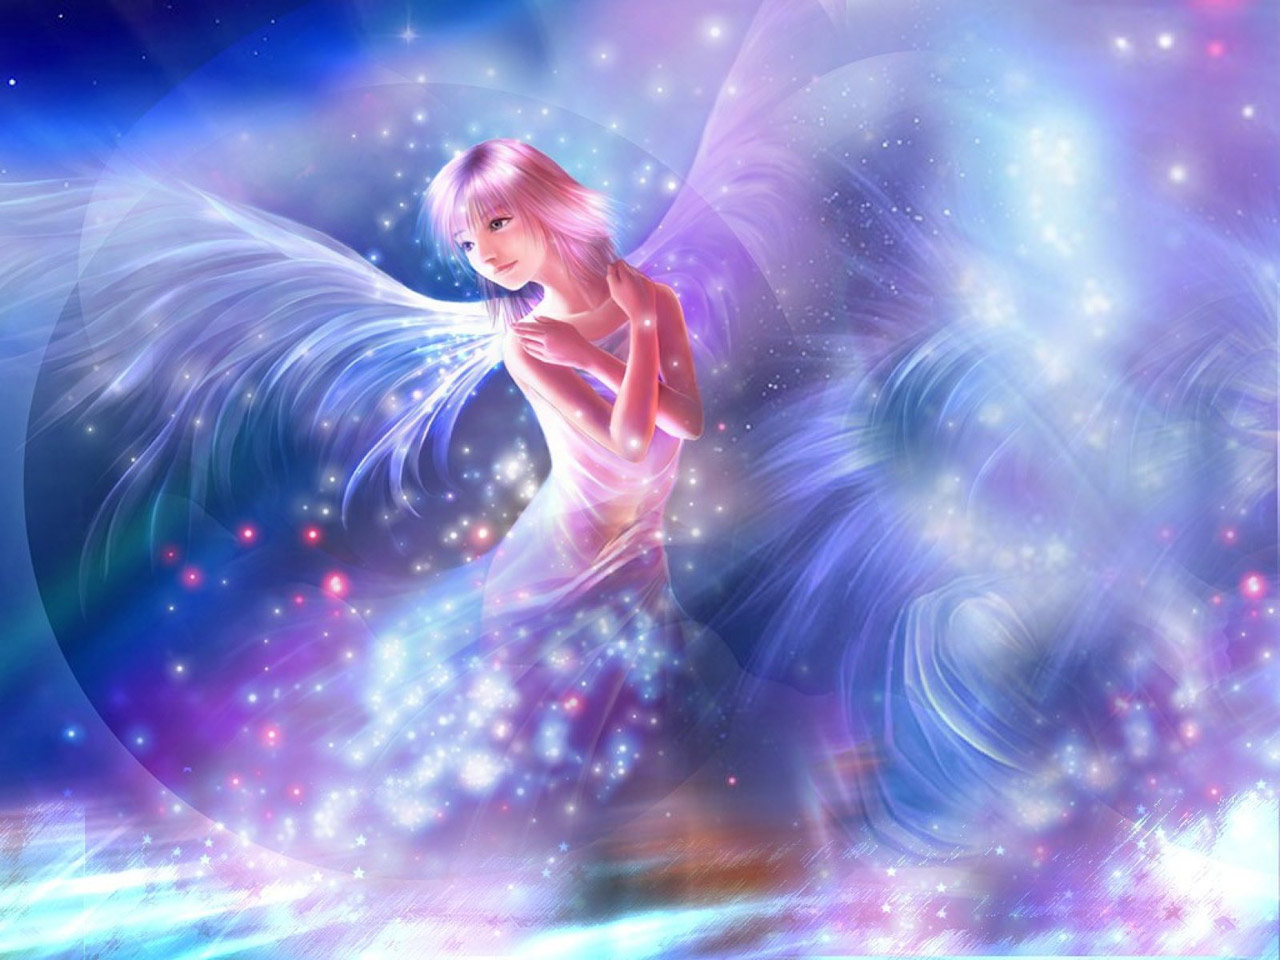 desktop wallpaper of shining angel fantasy computer desktop 1280x960